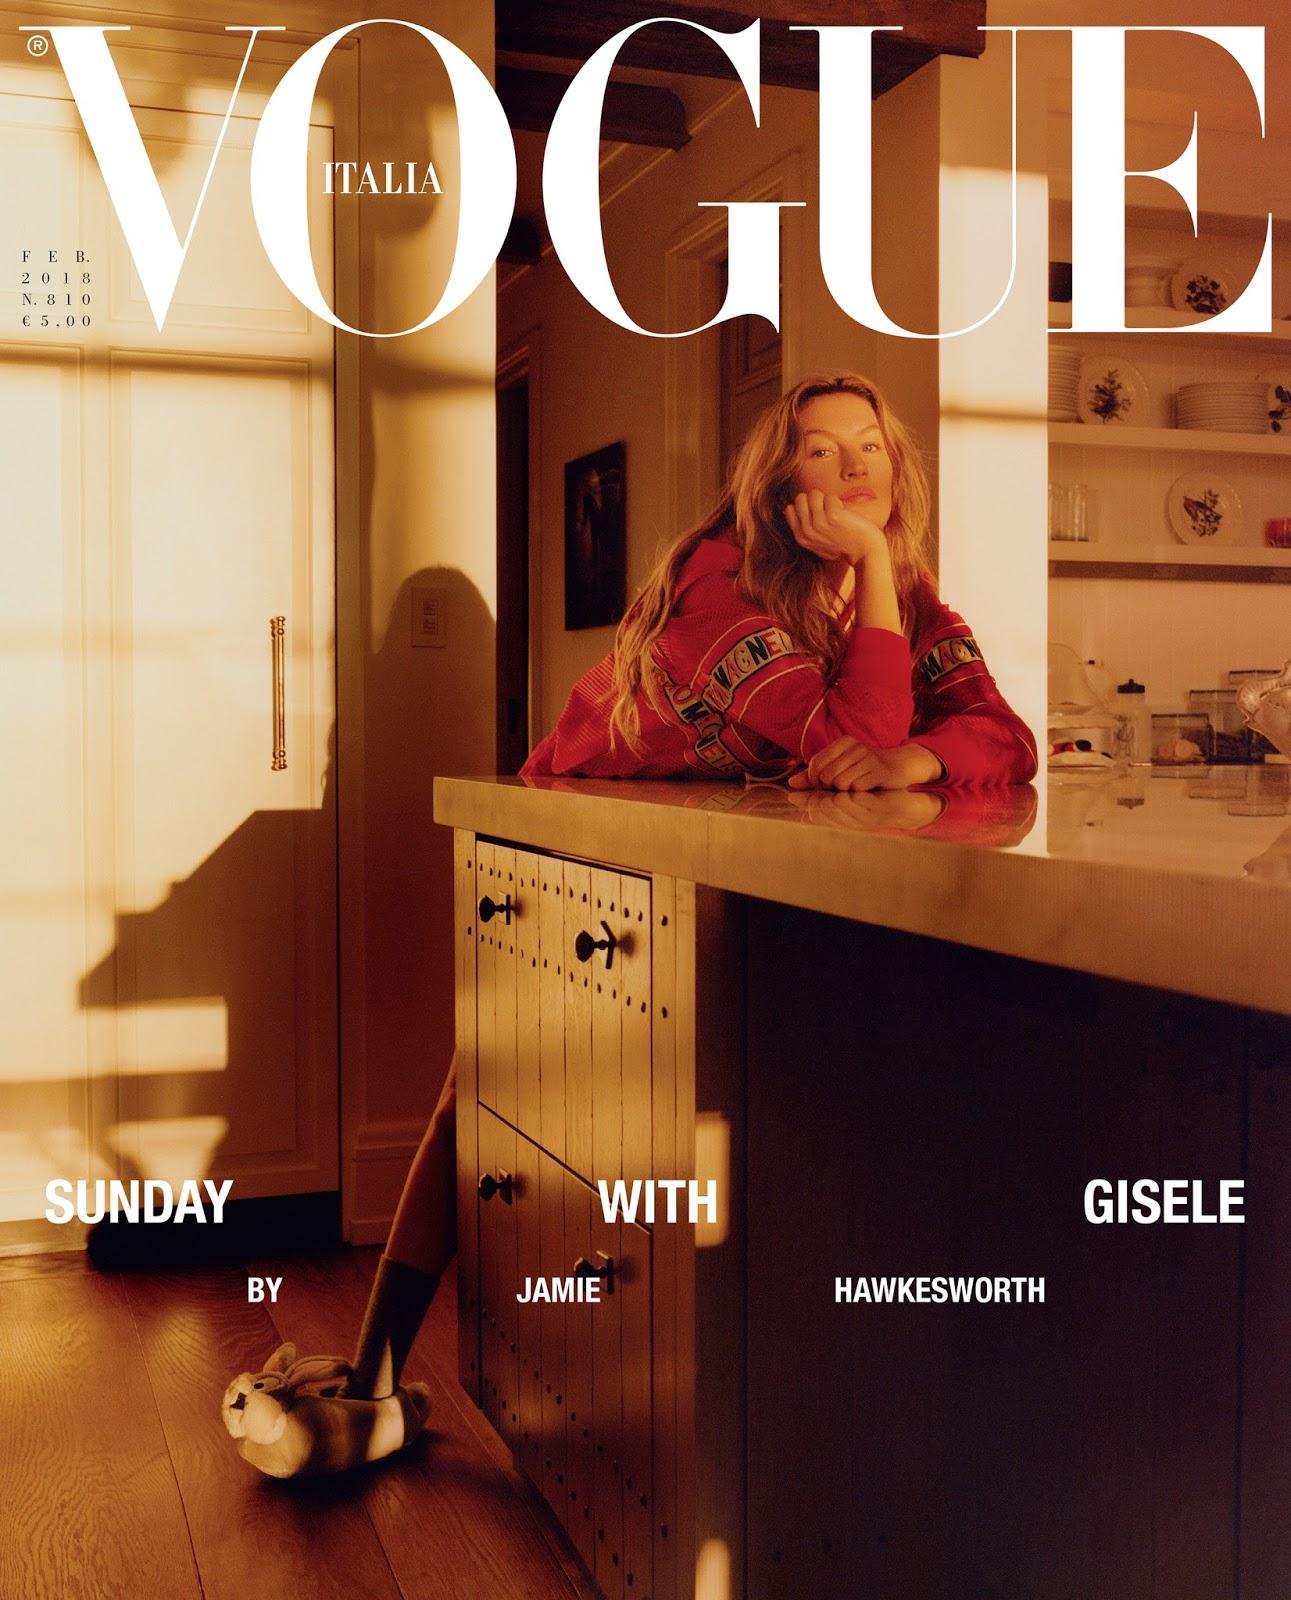 Vogue Italia February 2018 1.jpg